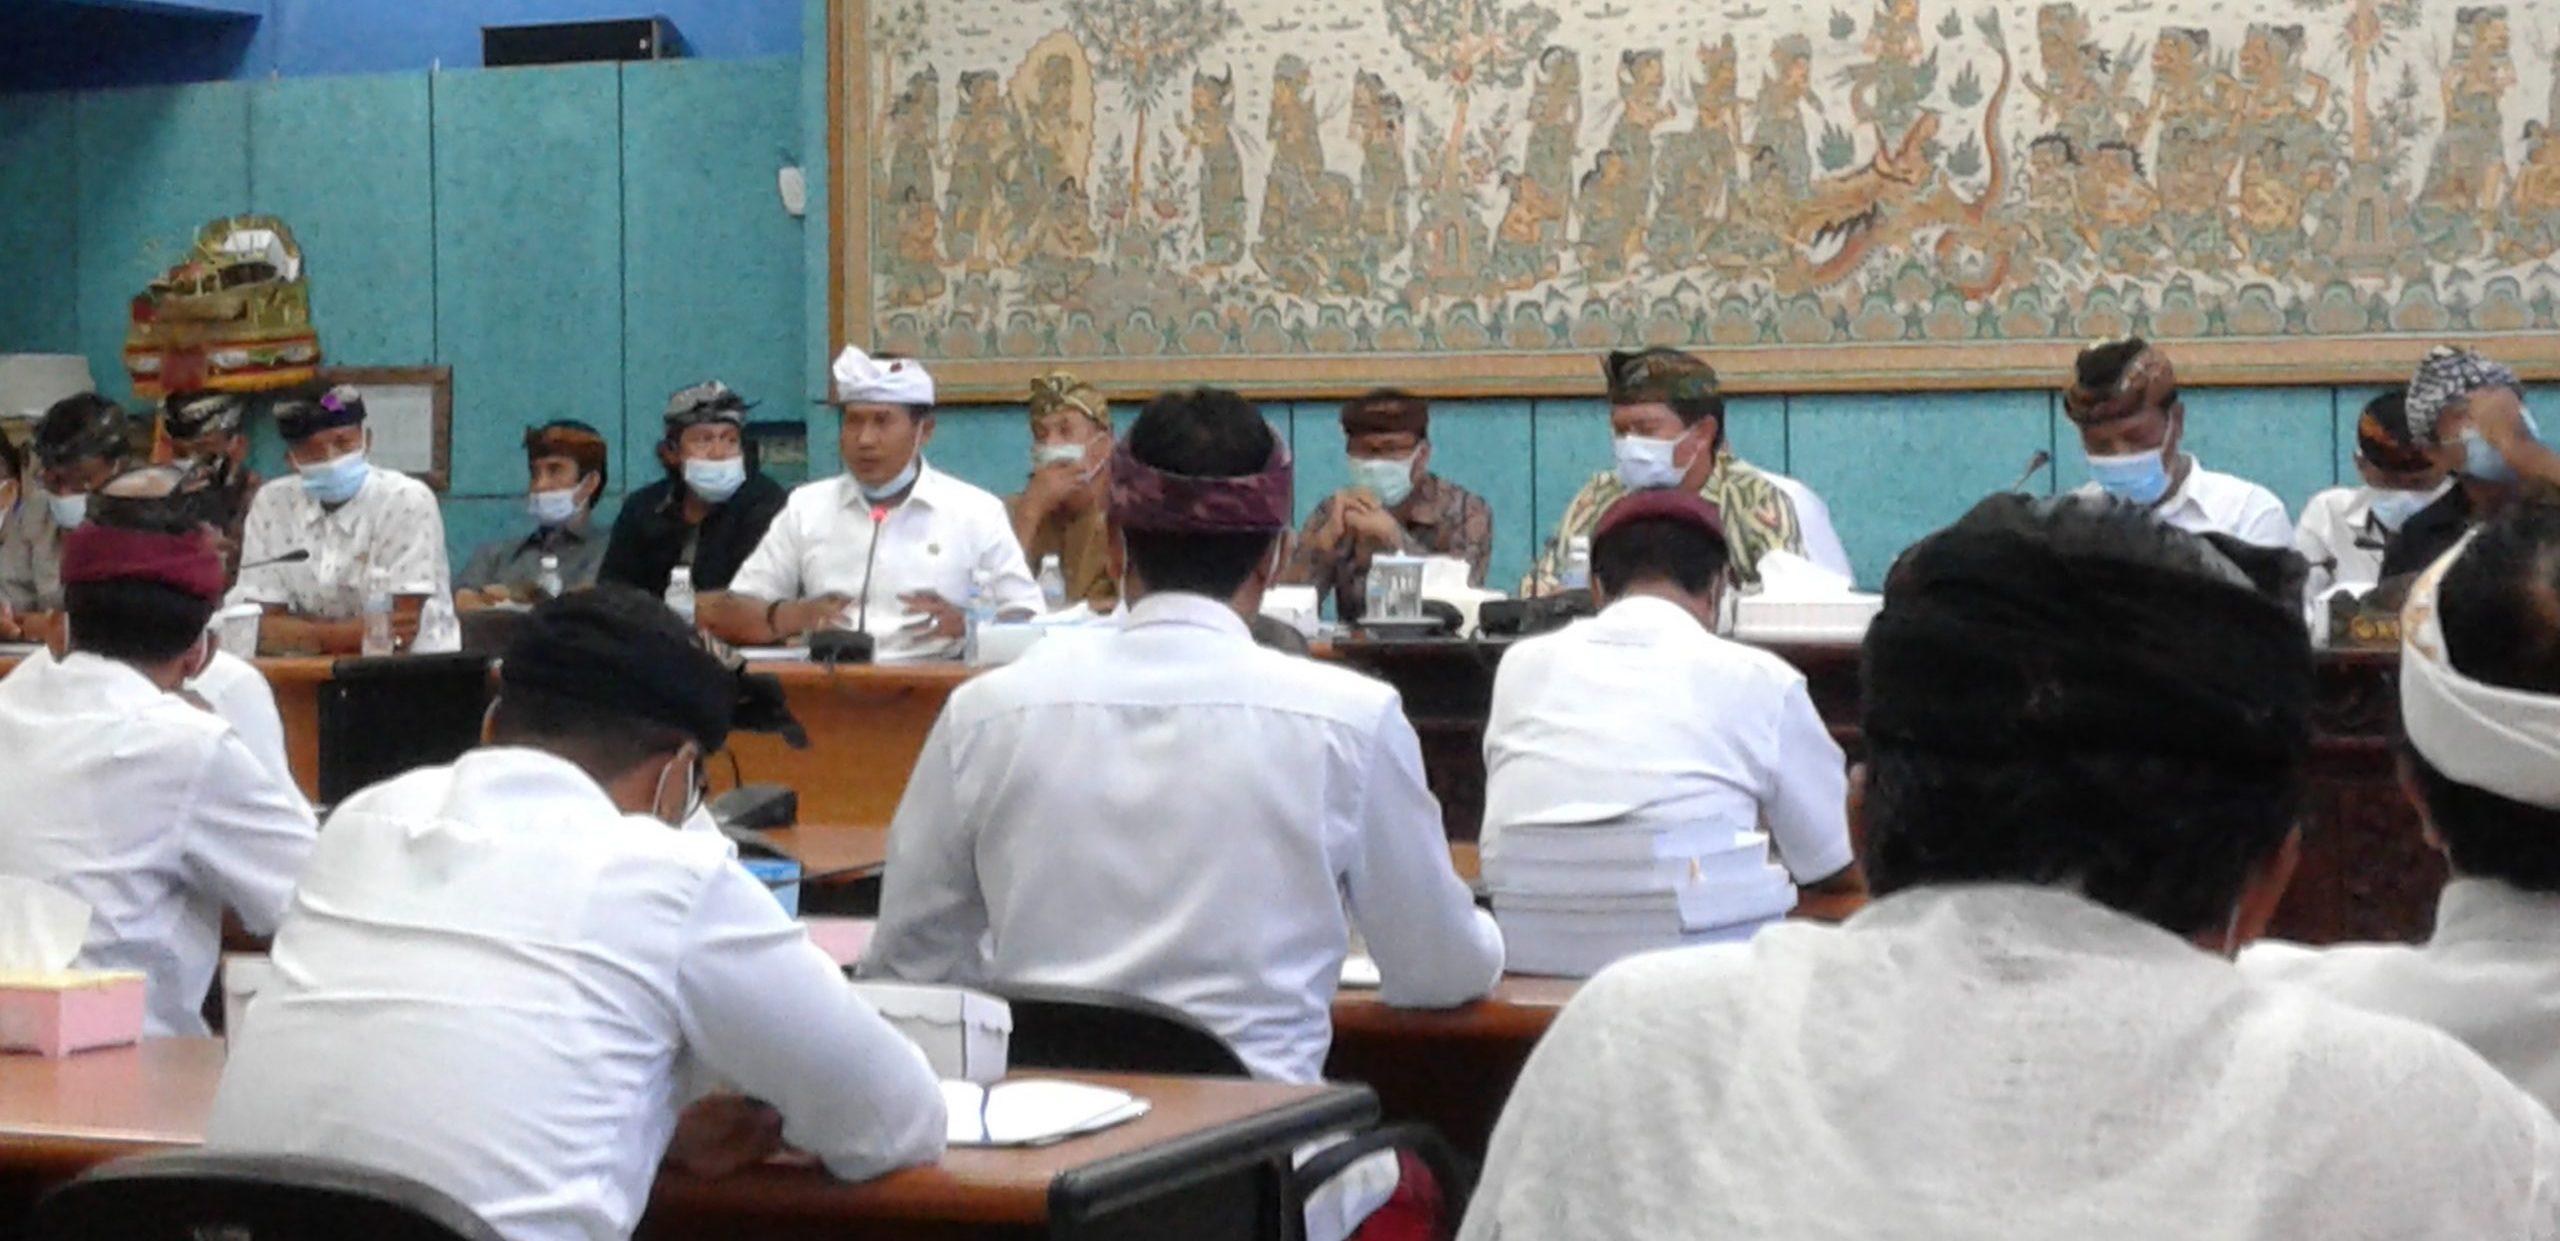 SUASANA rapat gabungan DPRD Klungkung dengan Pemkab Klungkung, Selasa (10/11/2020). Foto: ist